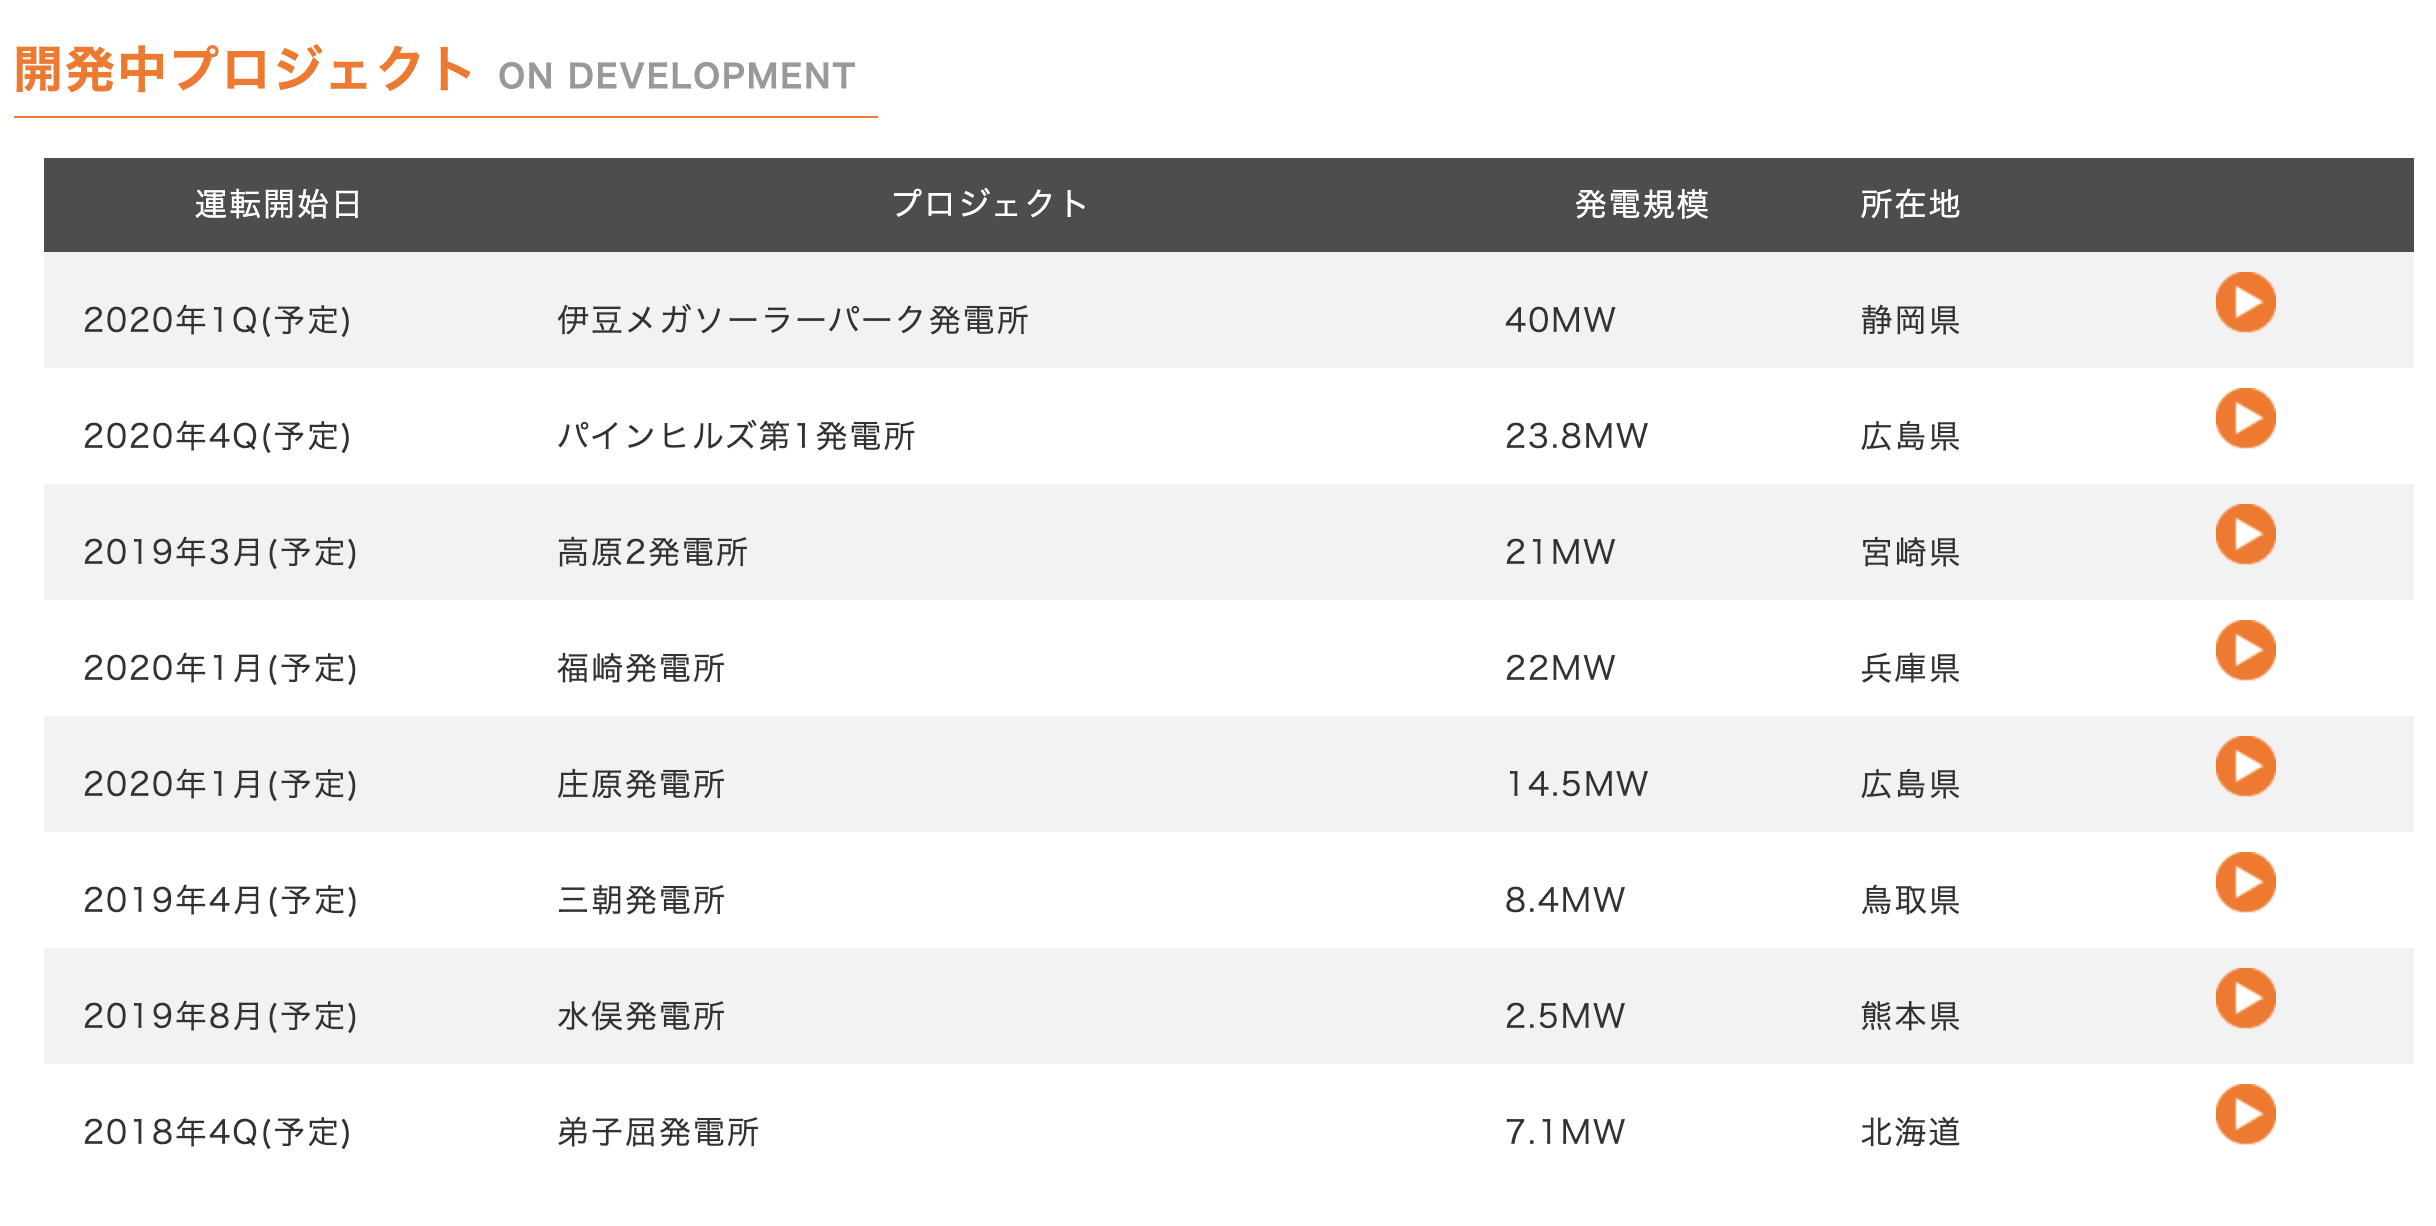 http://hecj.jp/business